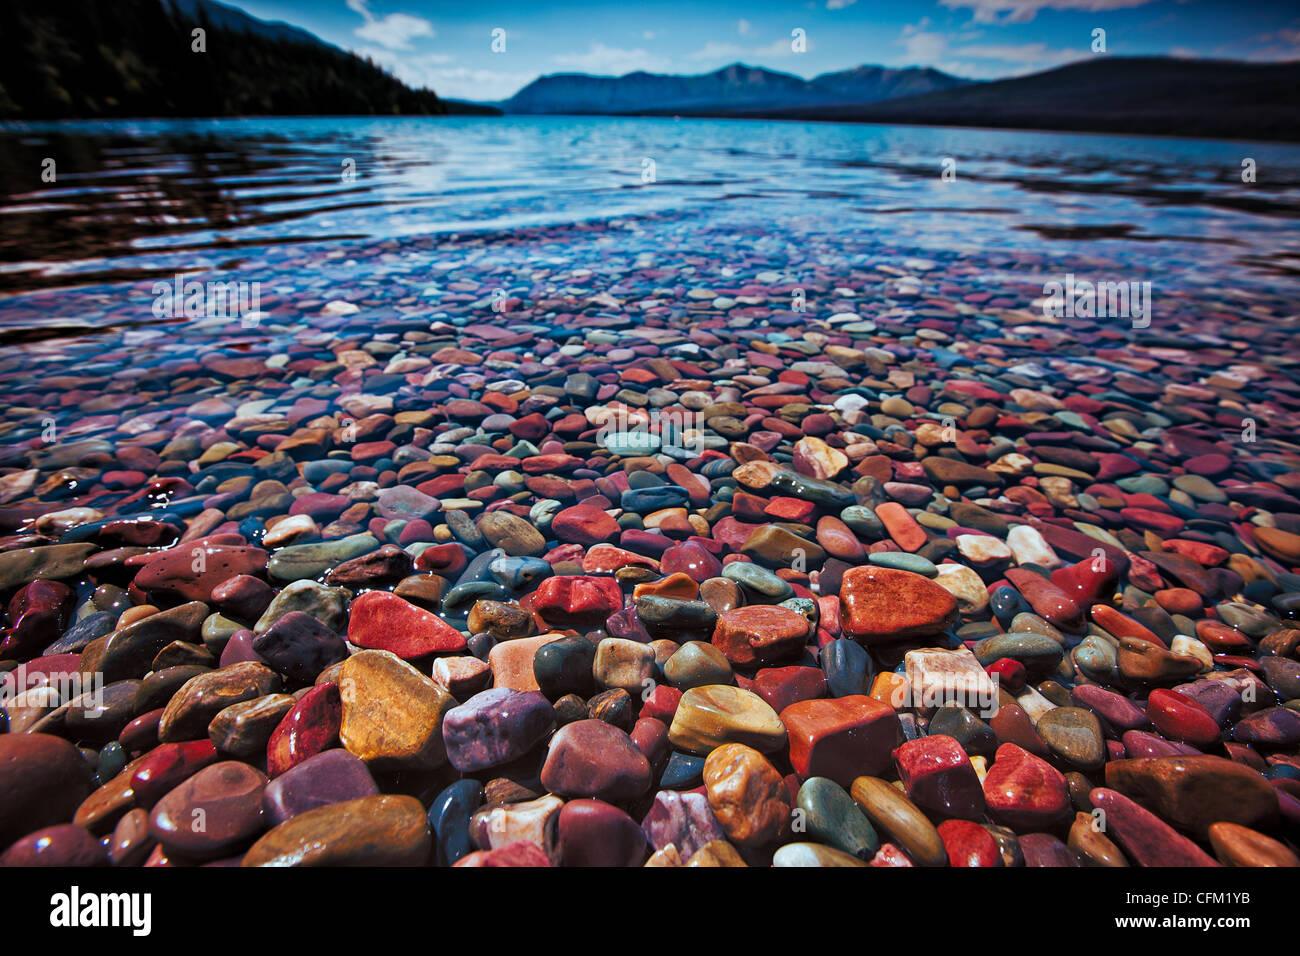 Fall Desktop Mountain Wallpaper Colorful Rocks On Lake Mcdonald In Glacier National Park